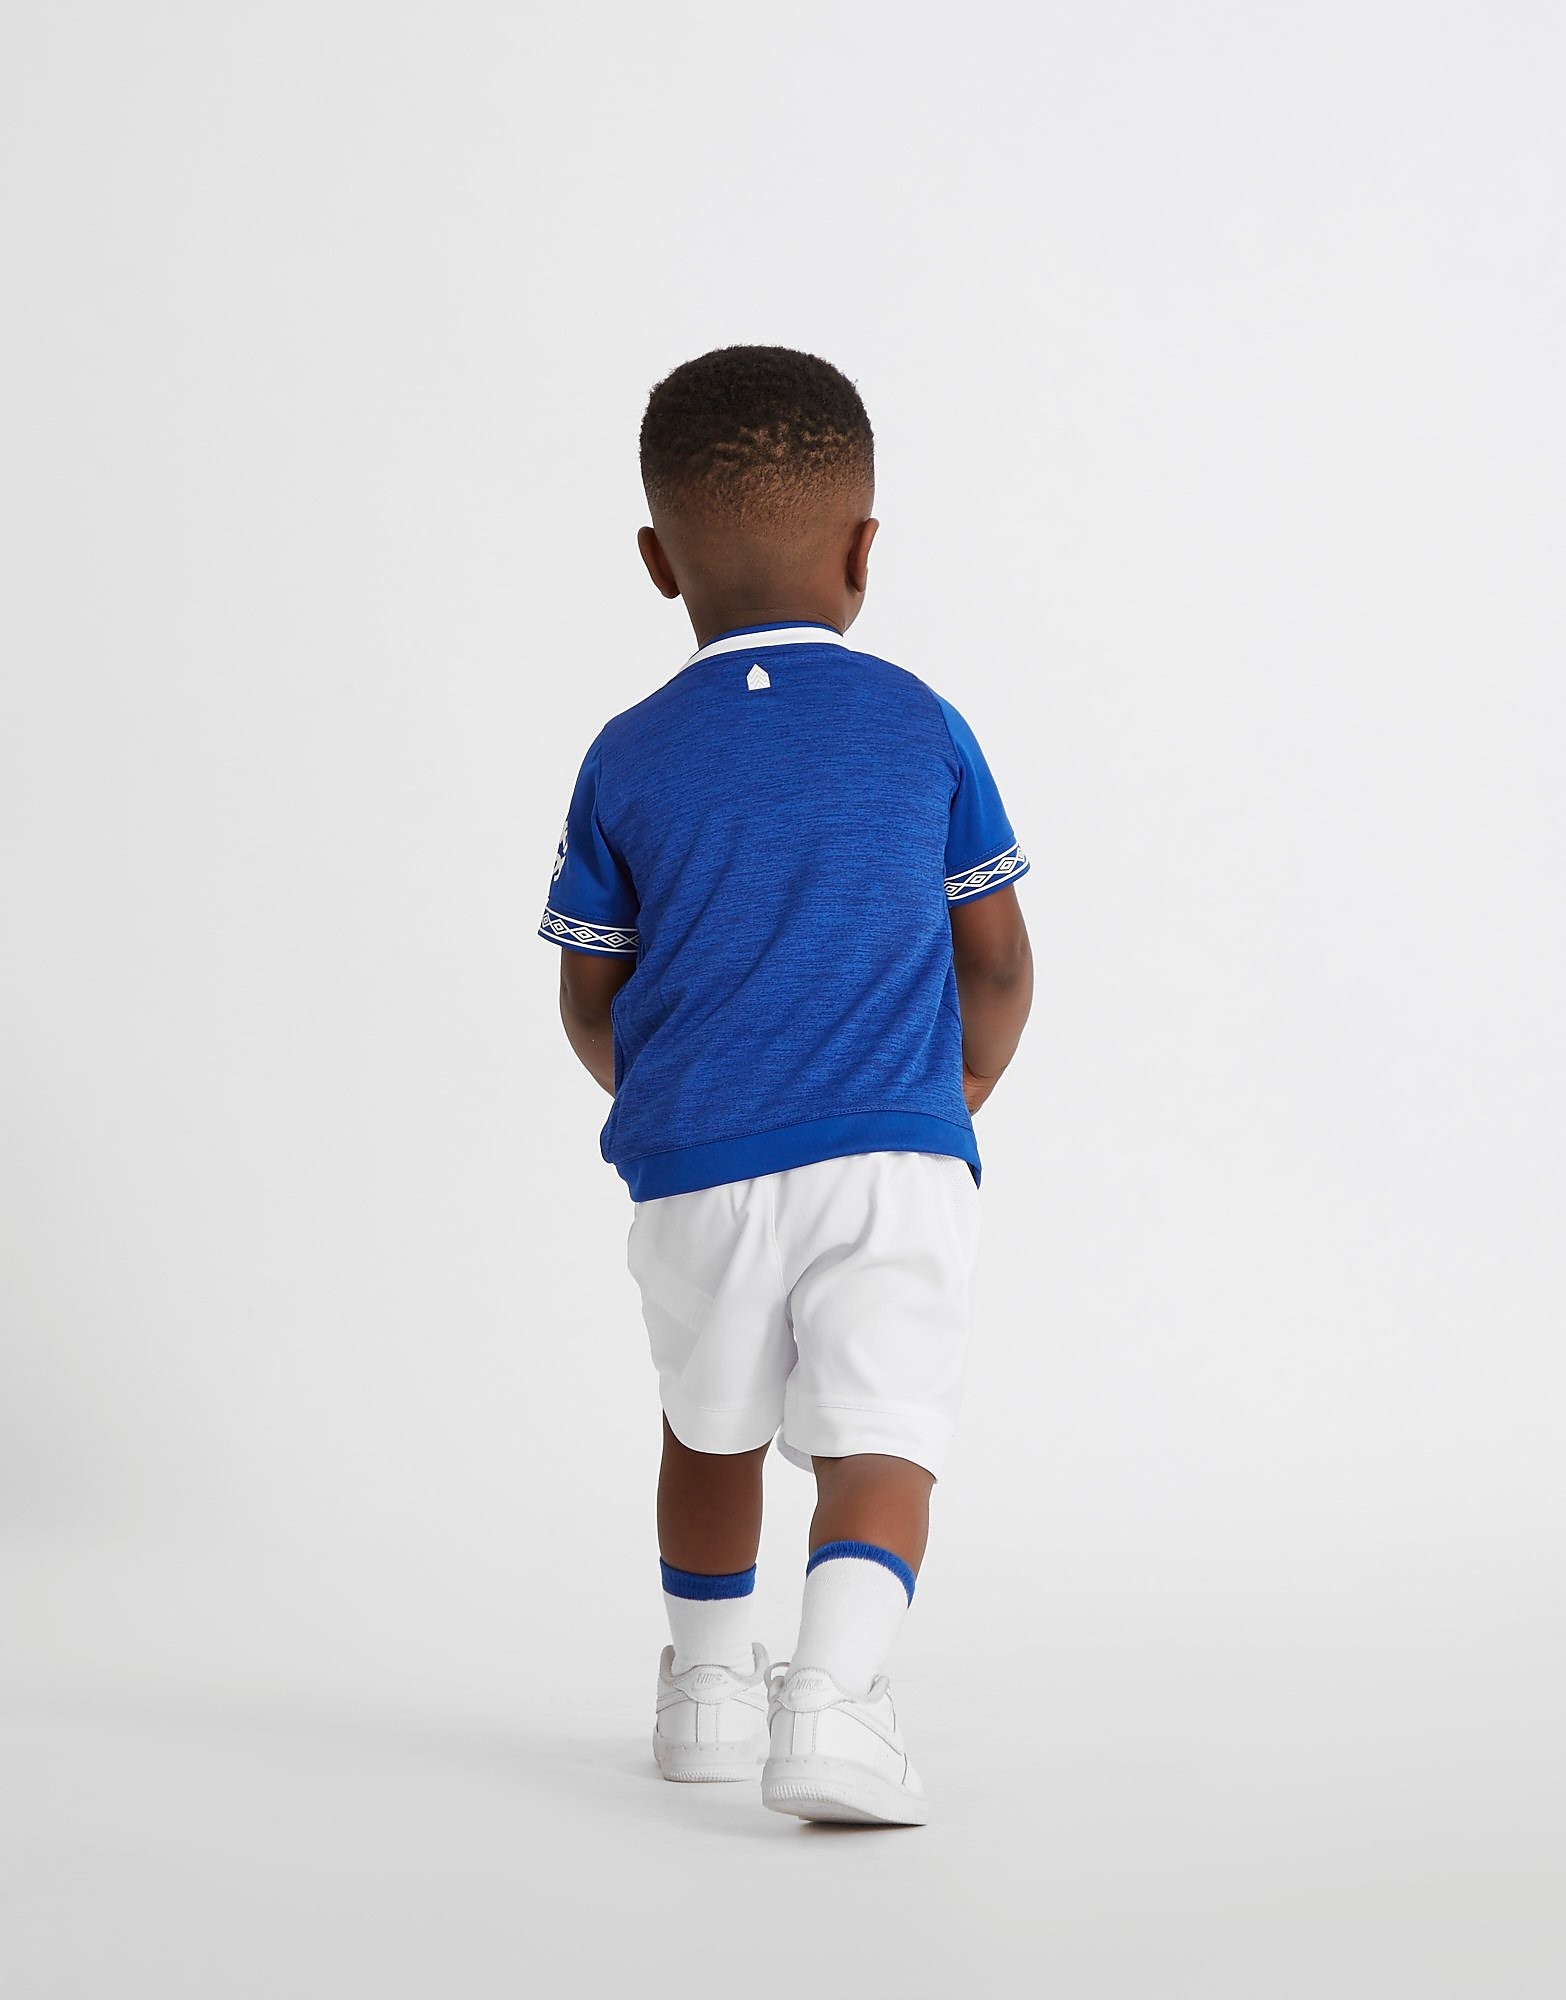 Umbro Everton FC 2018/19 Home Kit Infant